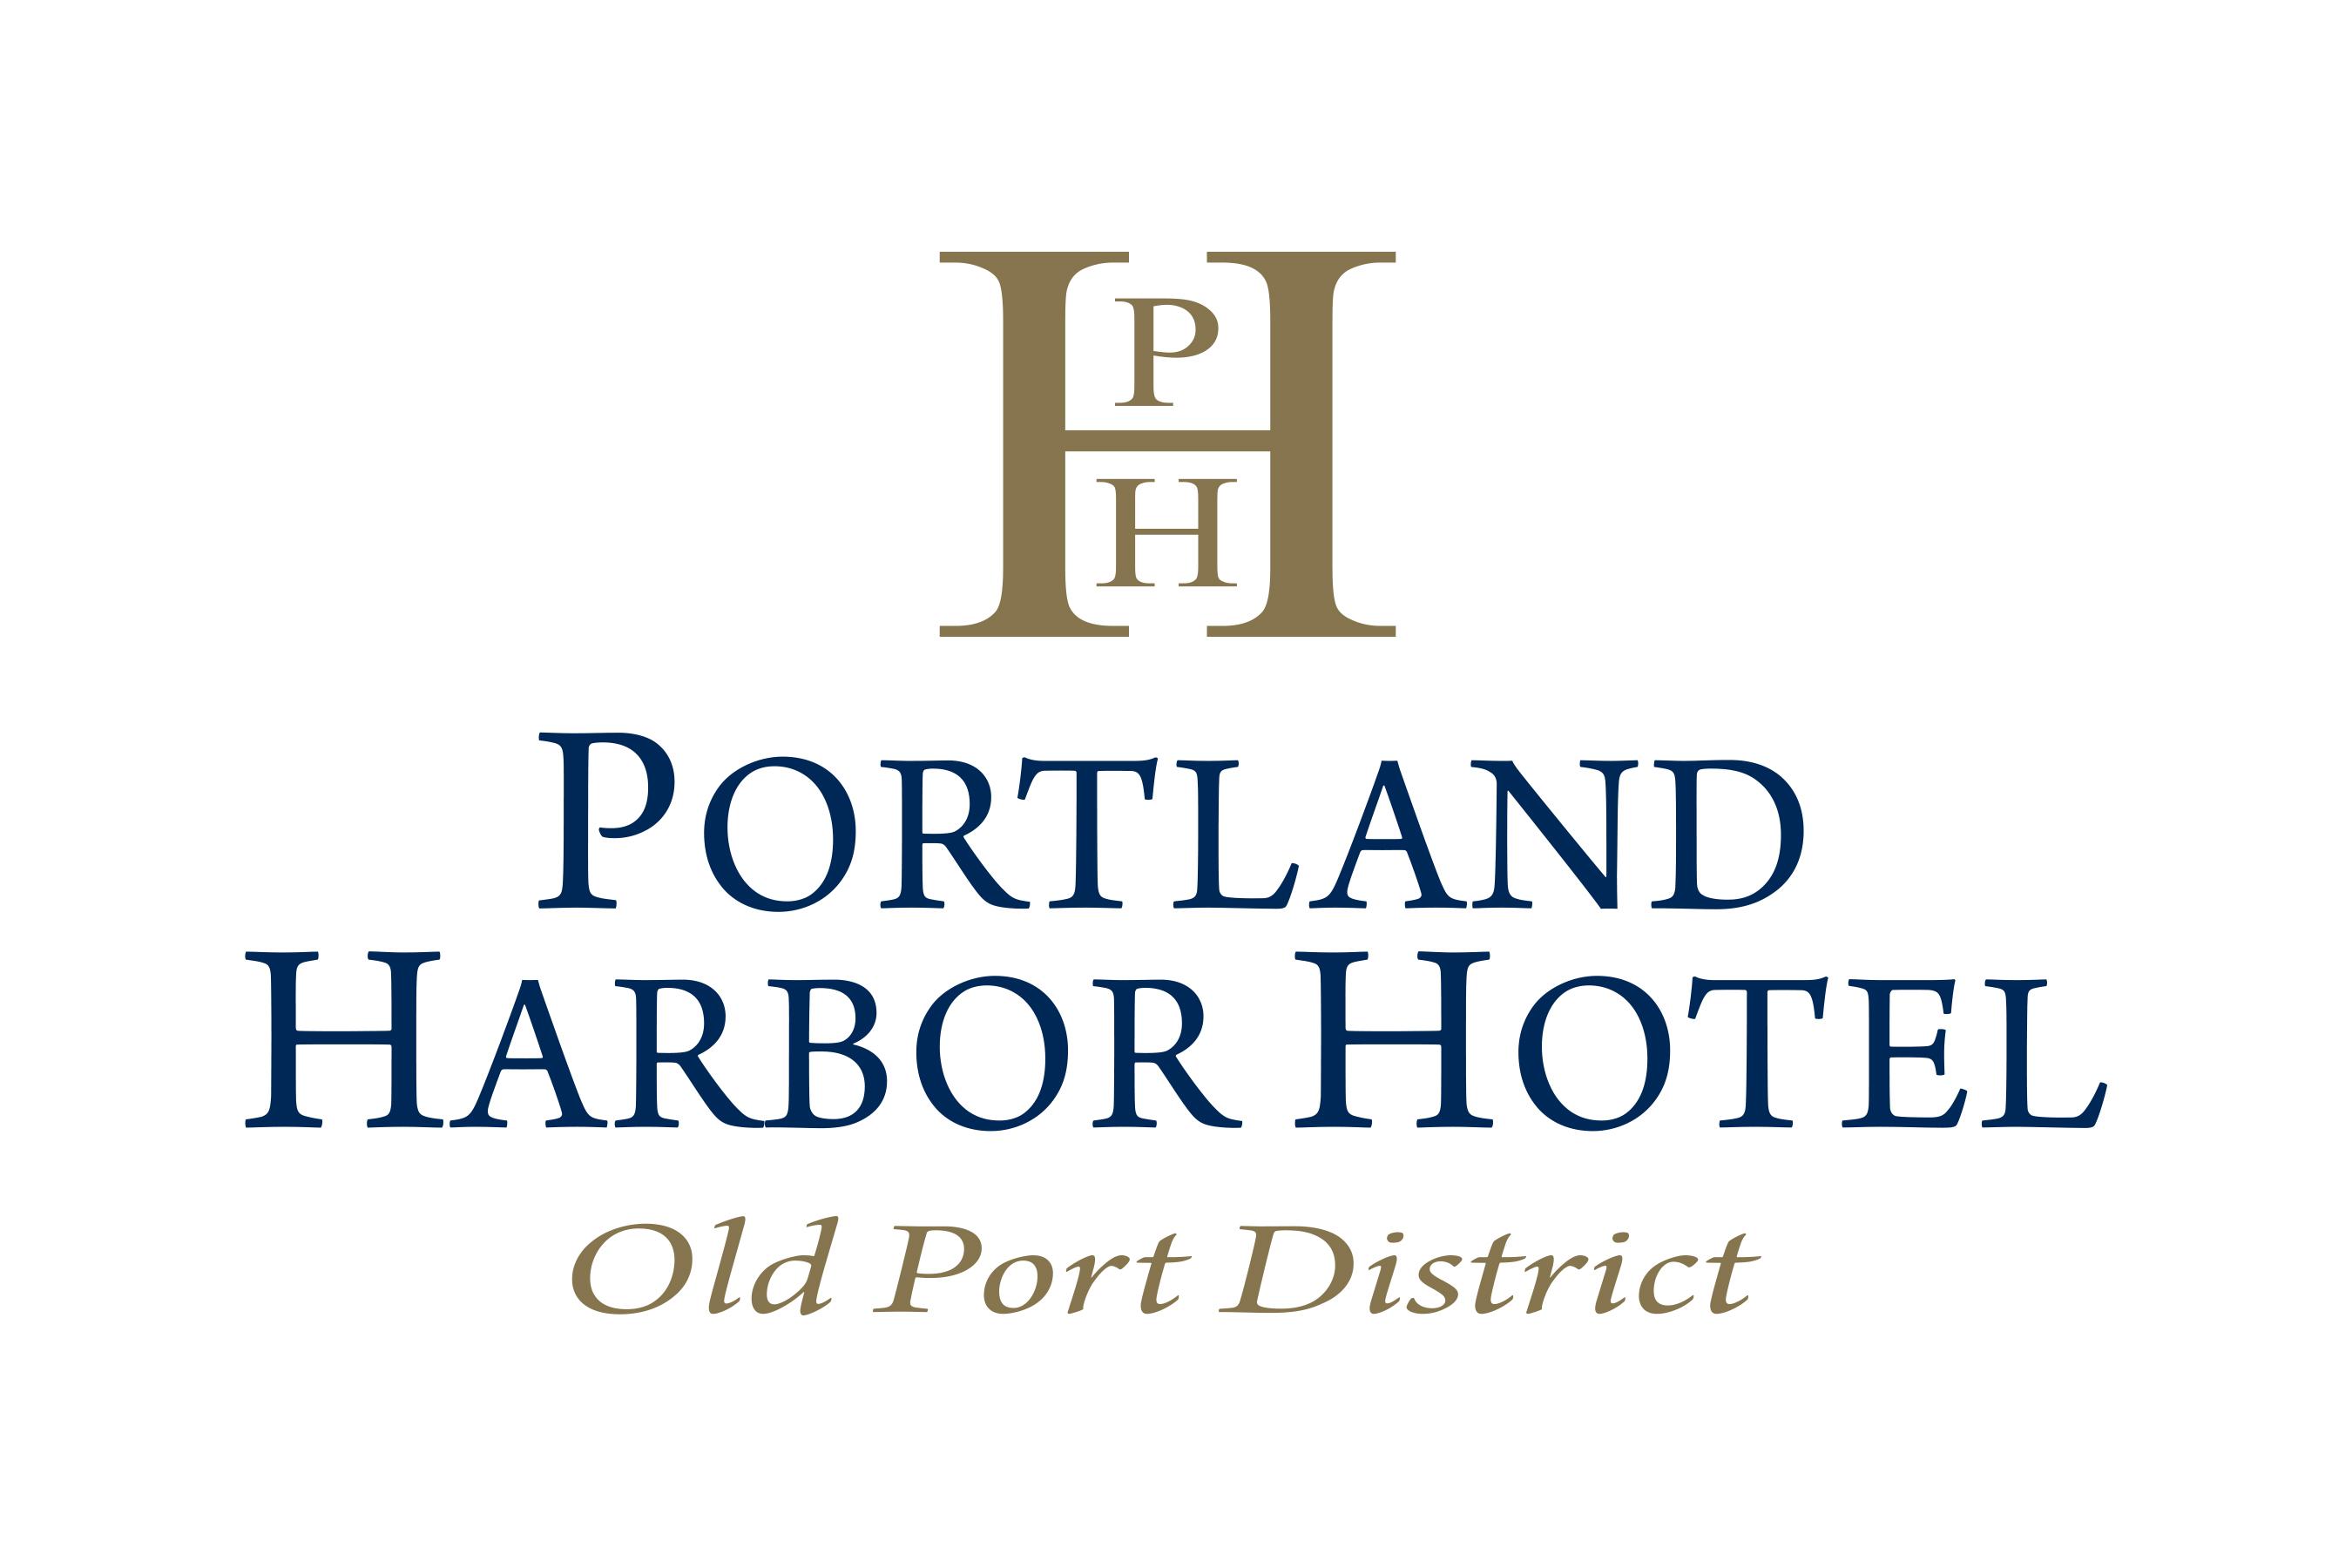 PortlandHarborHotel_Logo_2017_Stacked